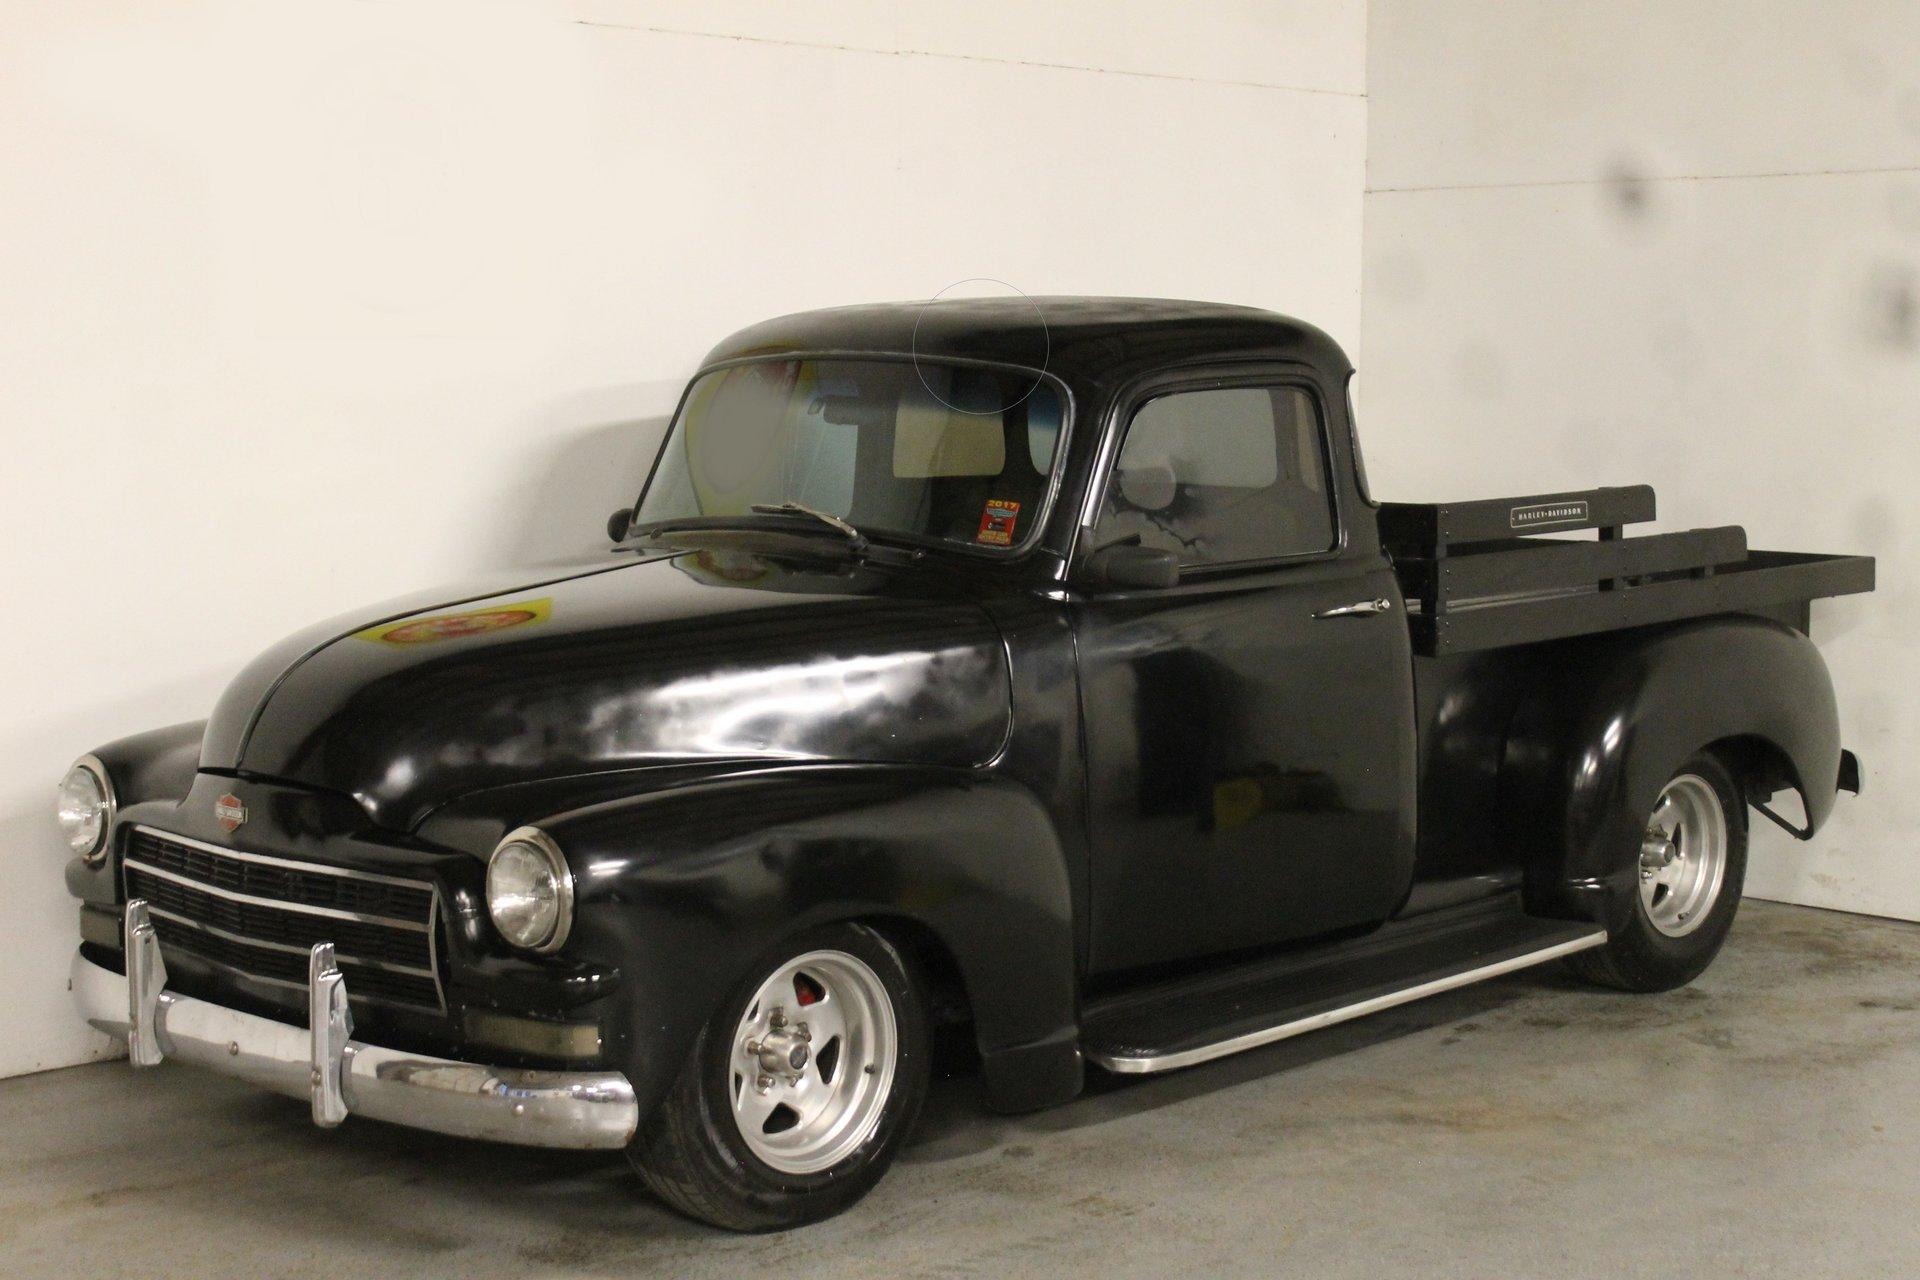 1954 Chevrolet 3100 Wheeler Auctions Pickup Truck For Sale